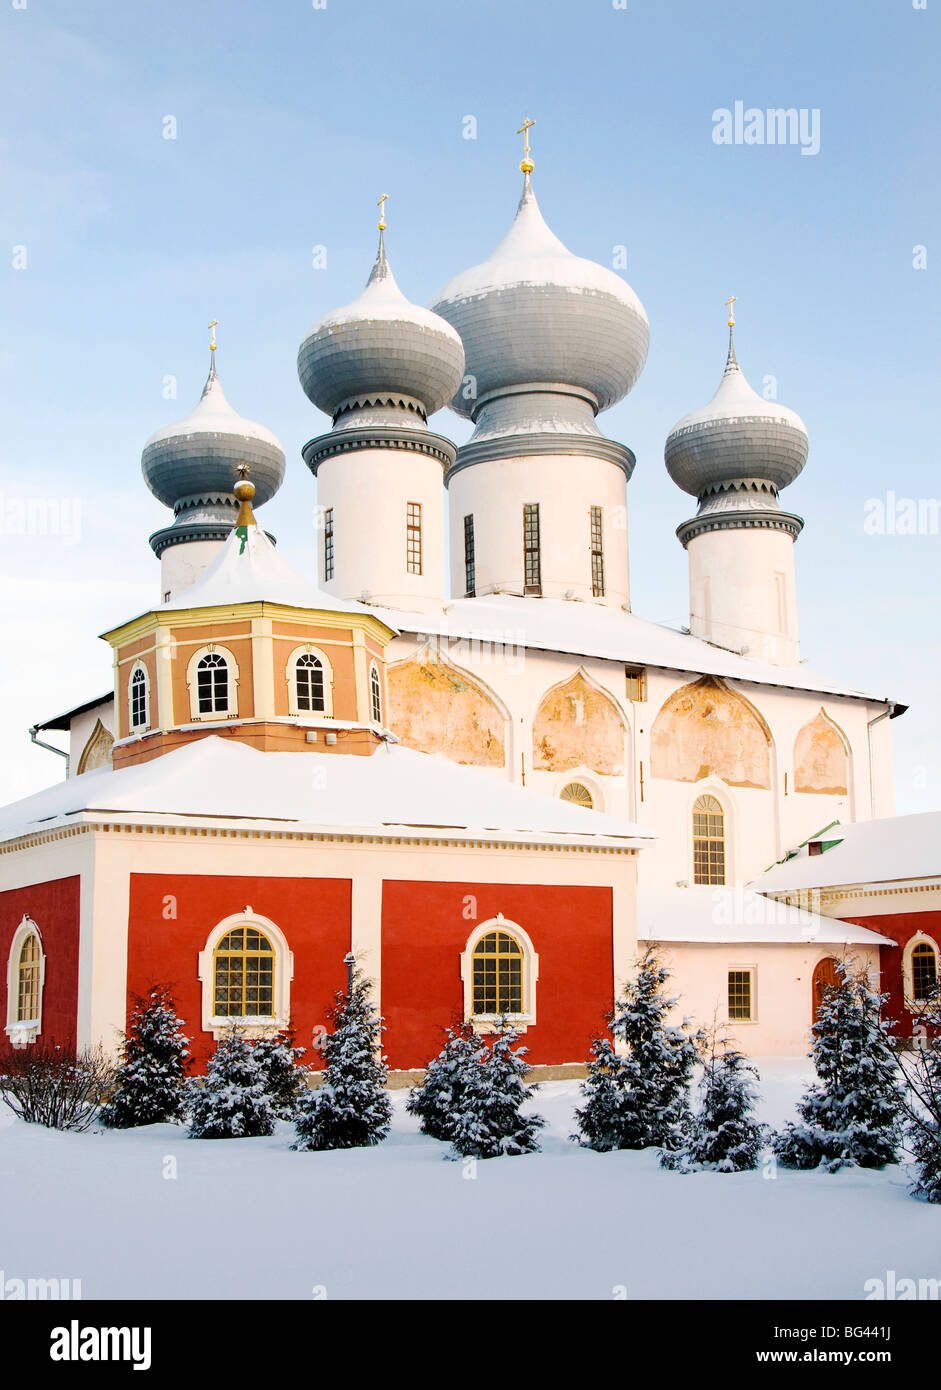 Uspensky Cathedral, Bogorodichno-Uspenskij Monastery, Tikhvin, Leningrad region, Russia - Stock Image